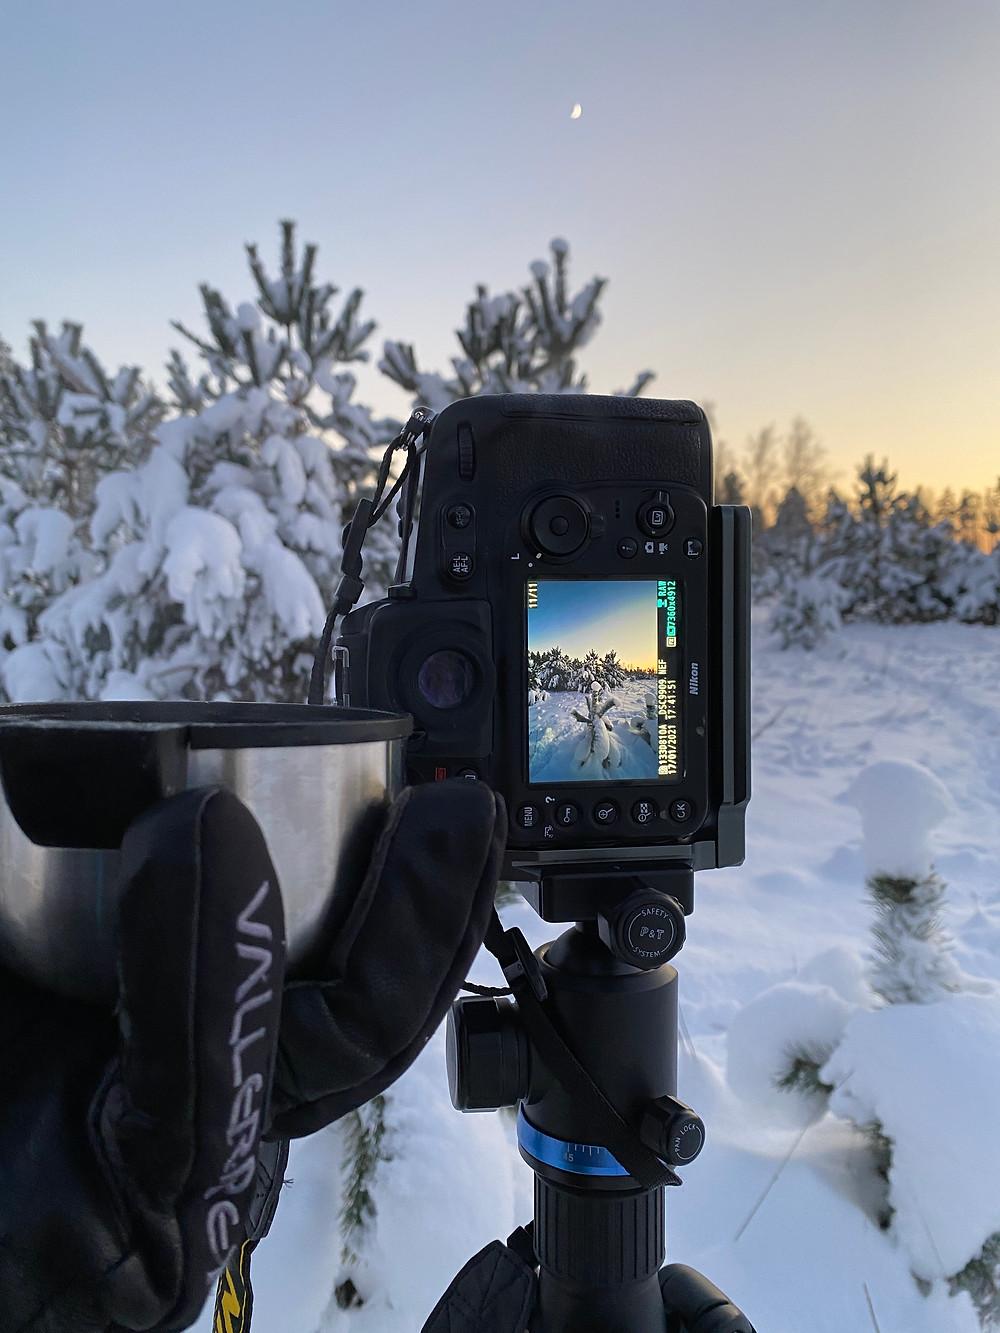 Nikon camera on a tripod shooting winter landscape while having a tea